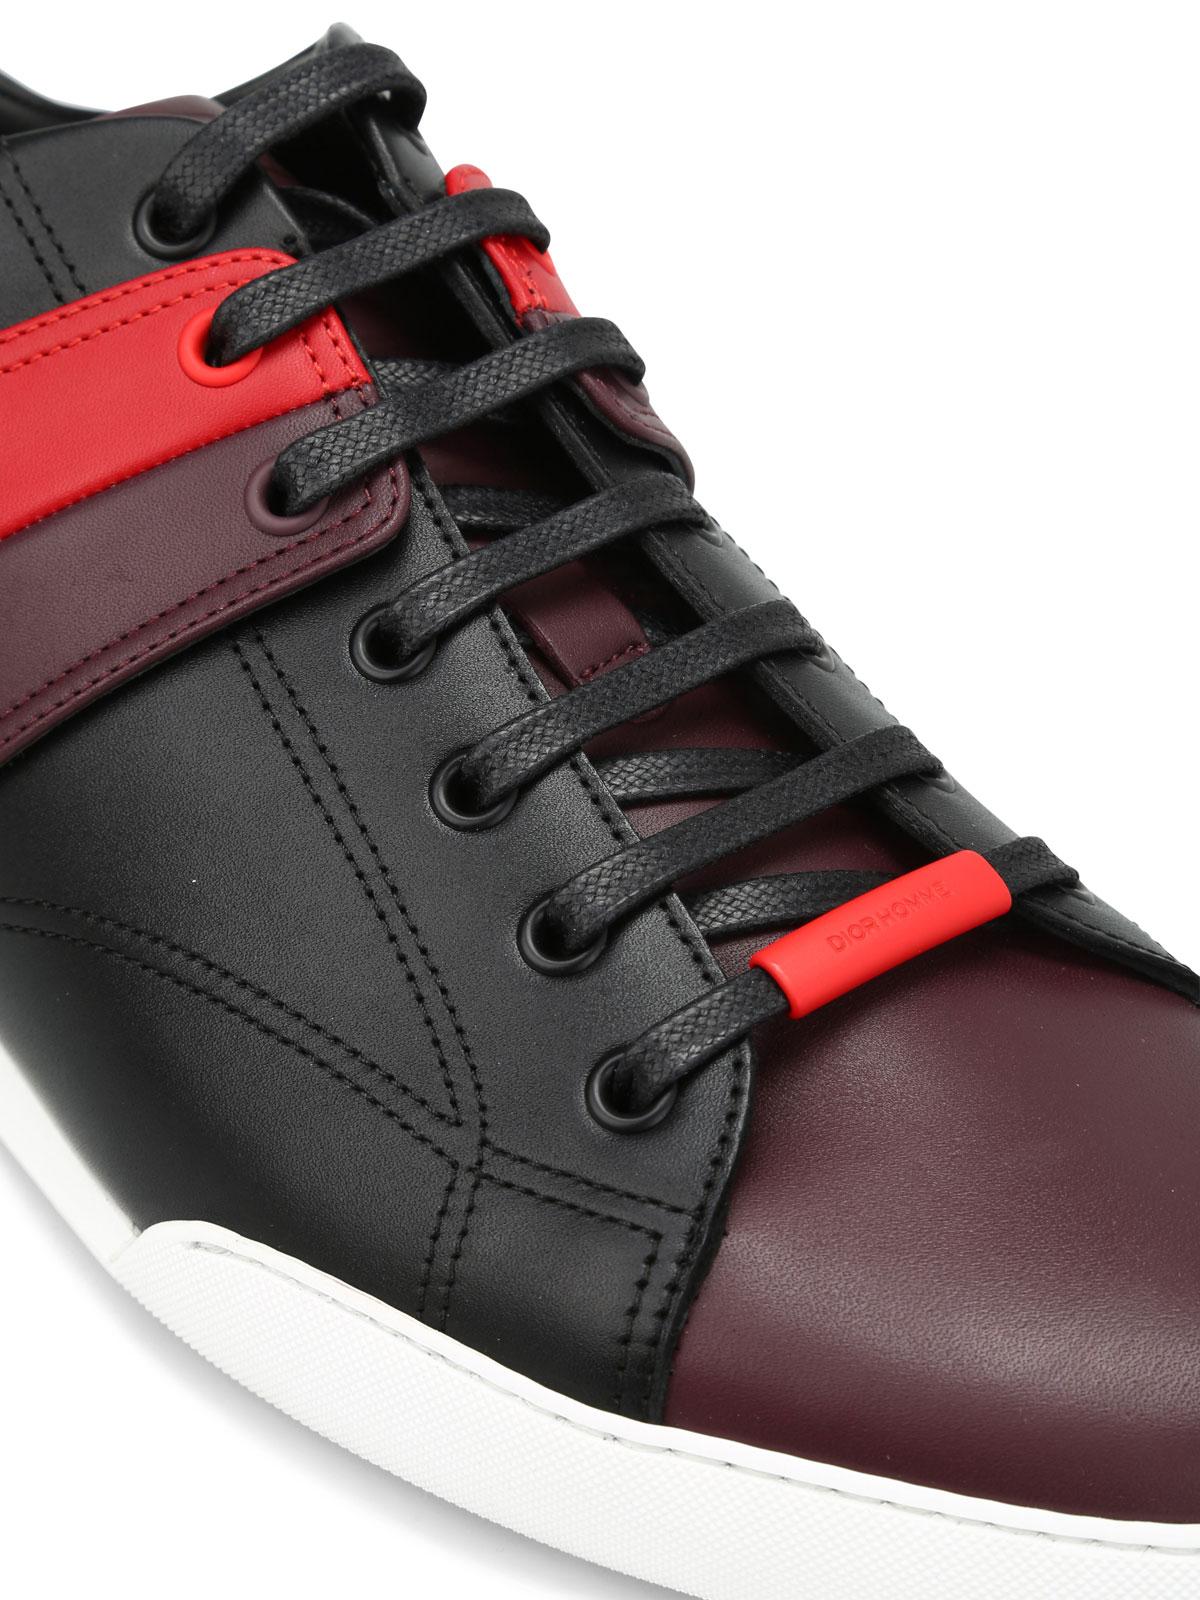 27cba5475c6 Dior - Baskets B18 Pour Homme - Chaussures de sport - 3SN197XBH 963